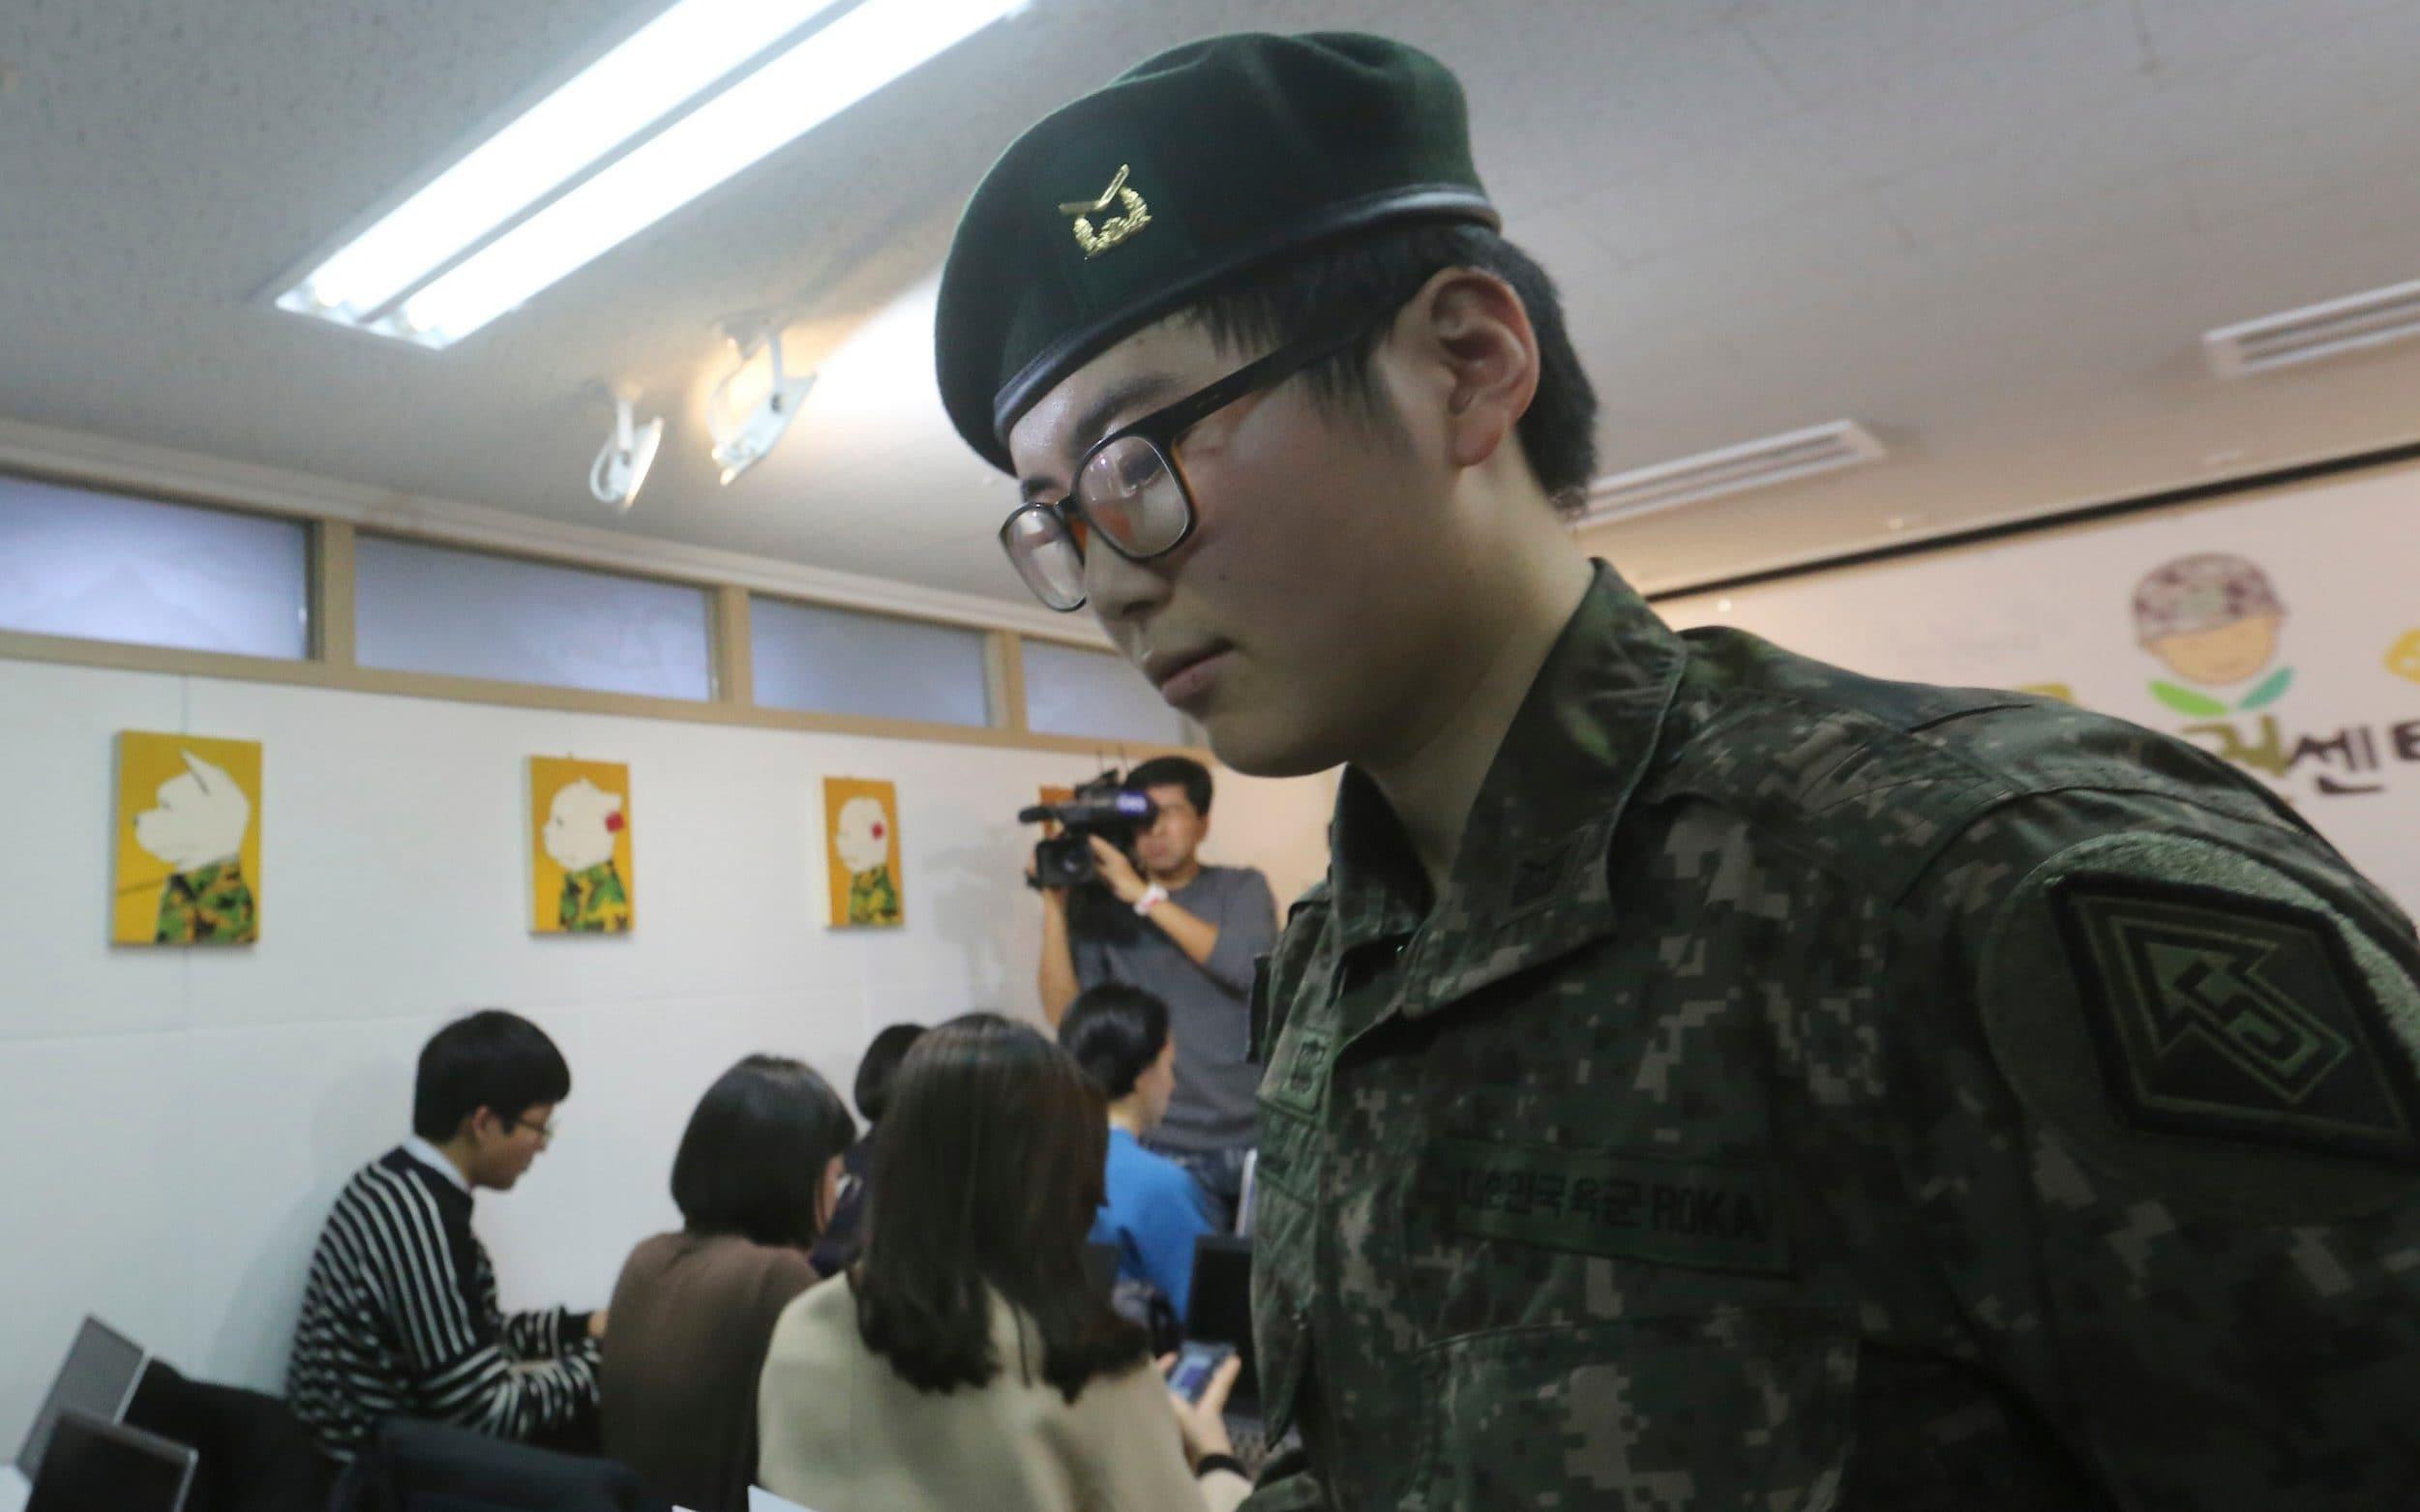 byun jin-soo